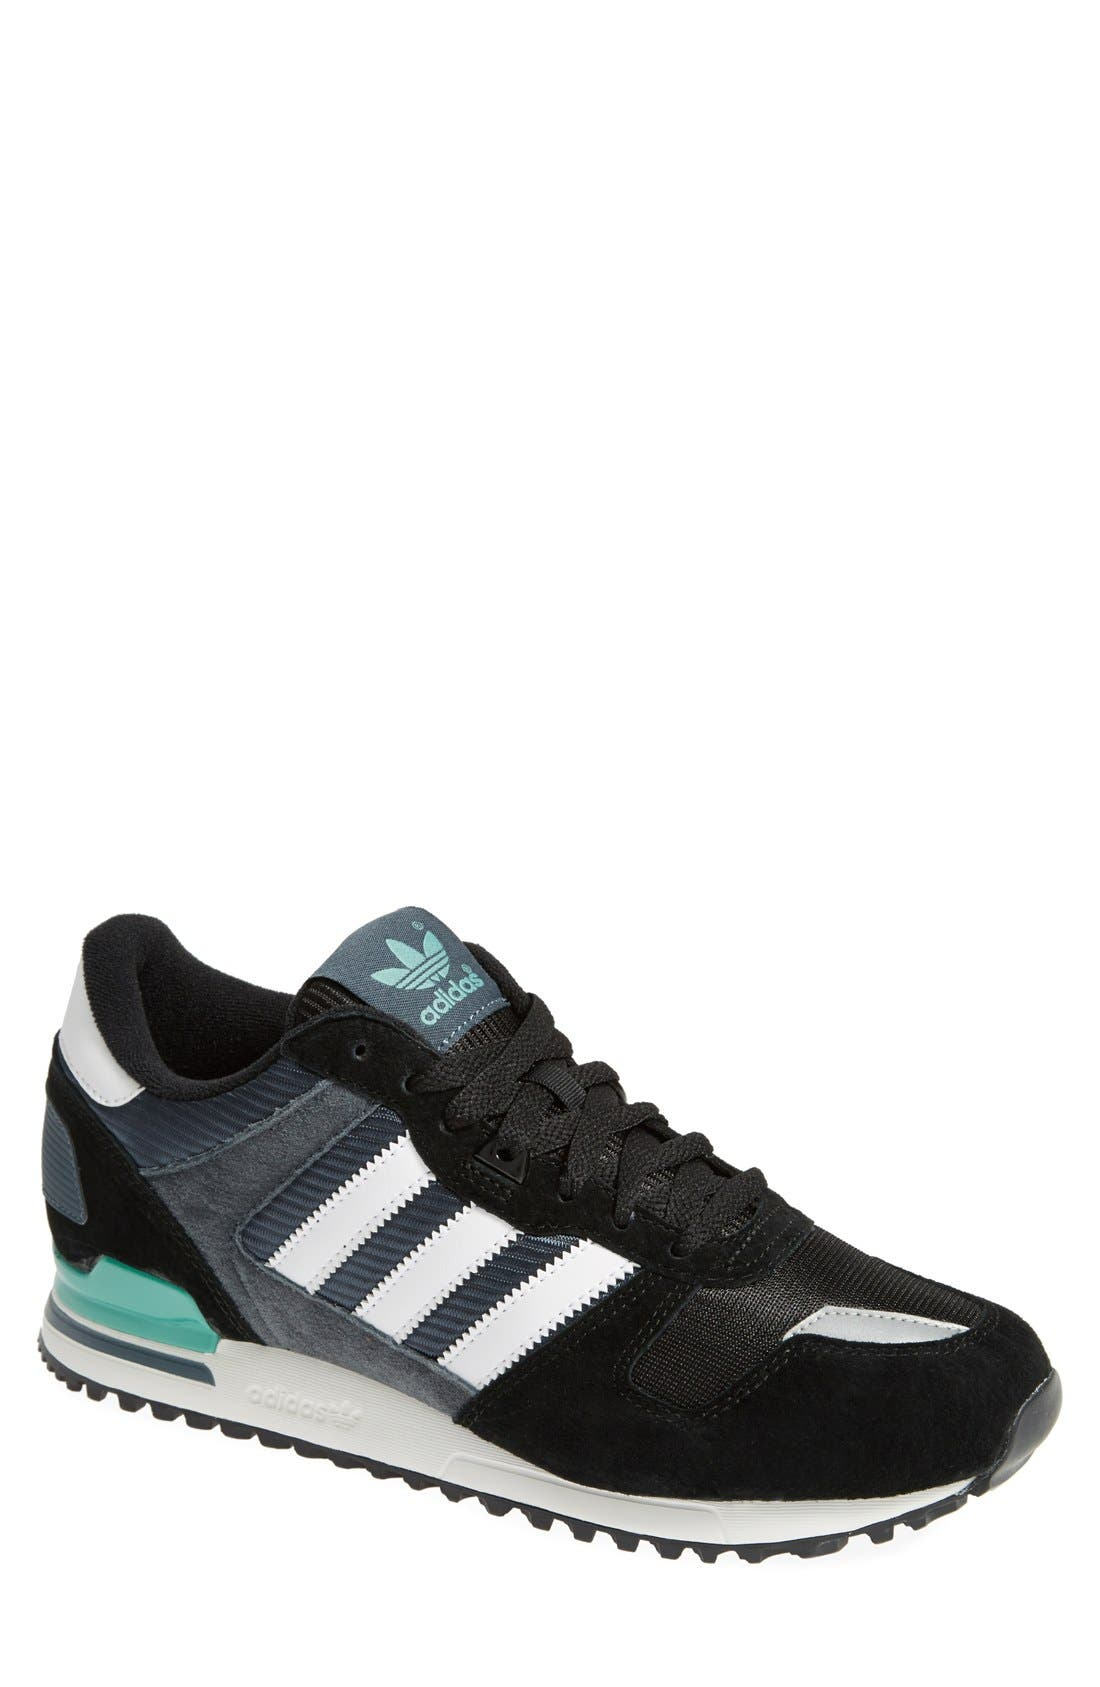 c55e5749f5931 ... hot adidas zx 700 sneaker men nordstrom 5ccdc 1af71